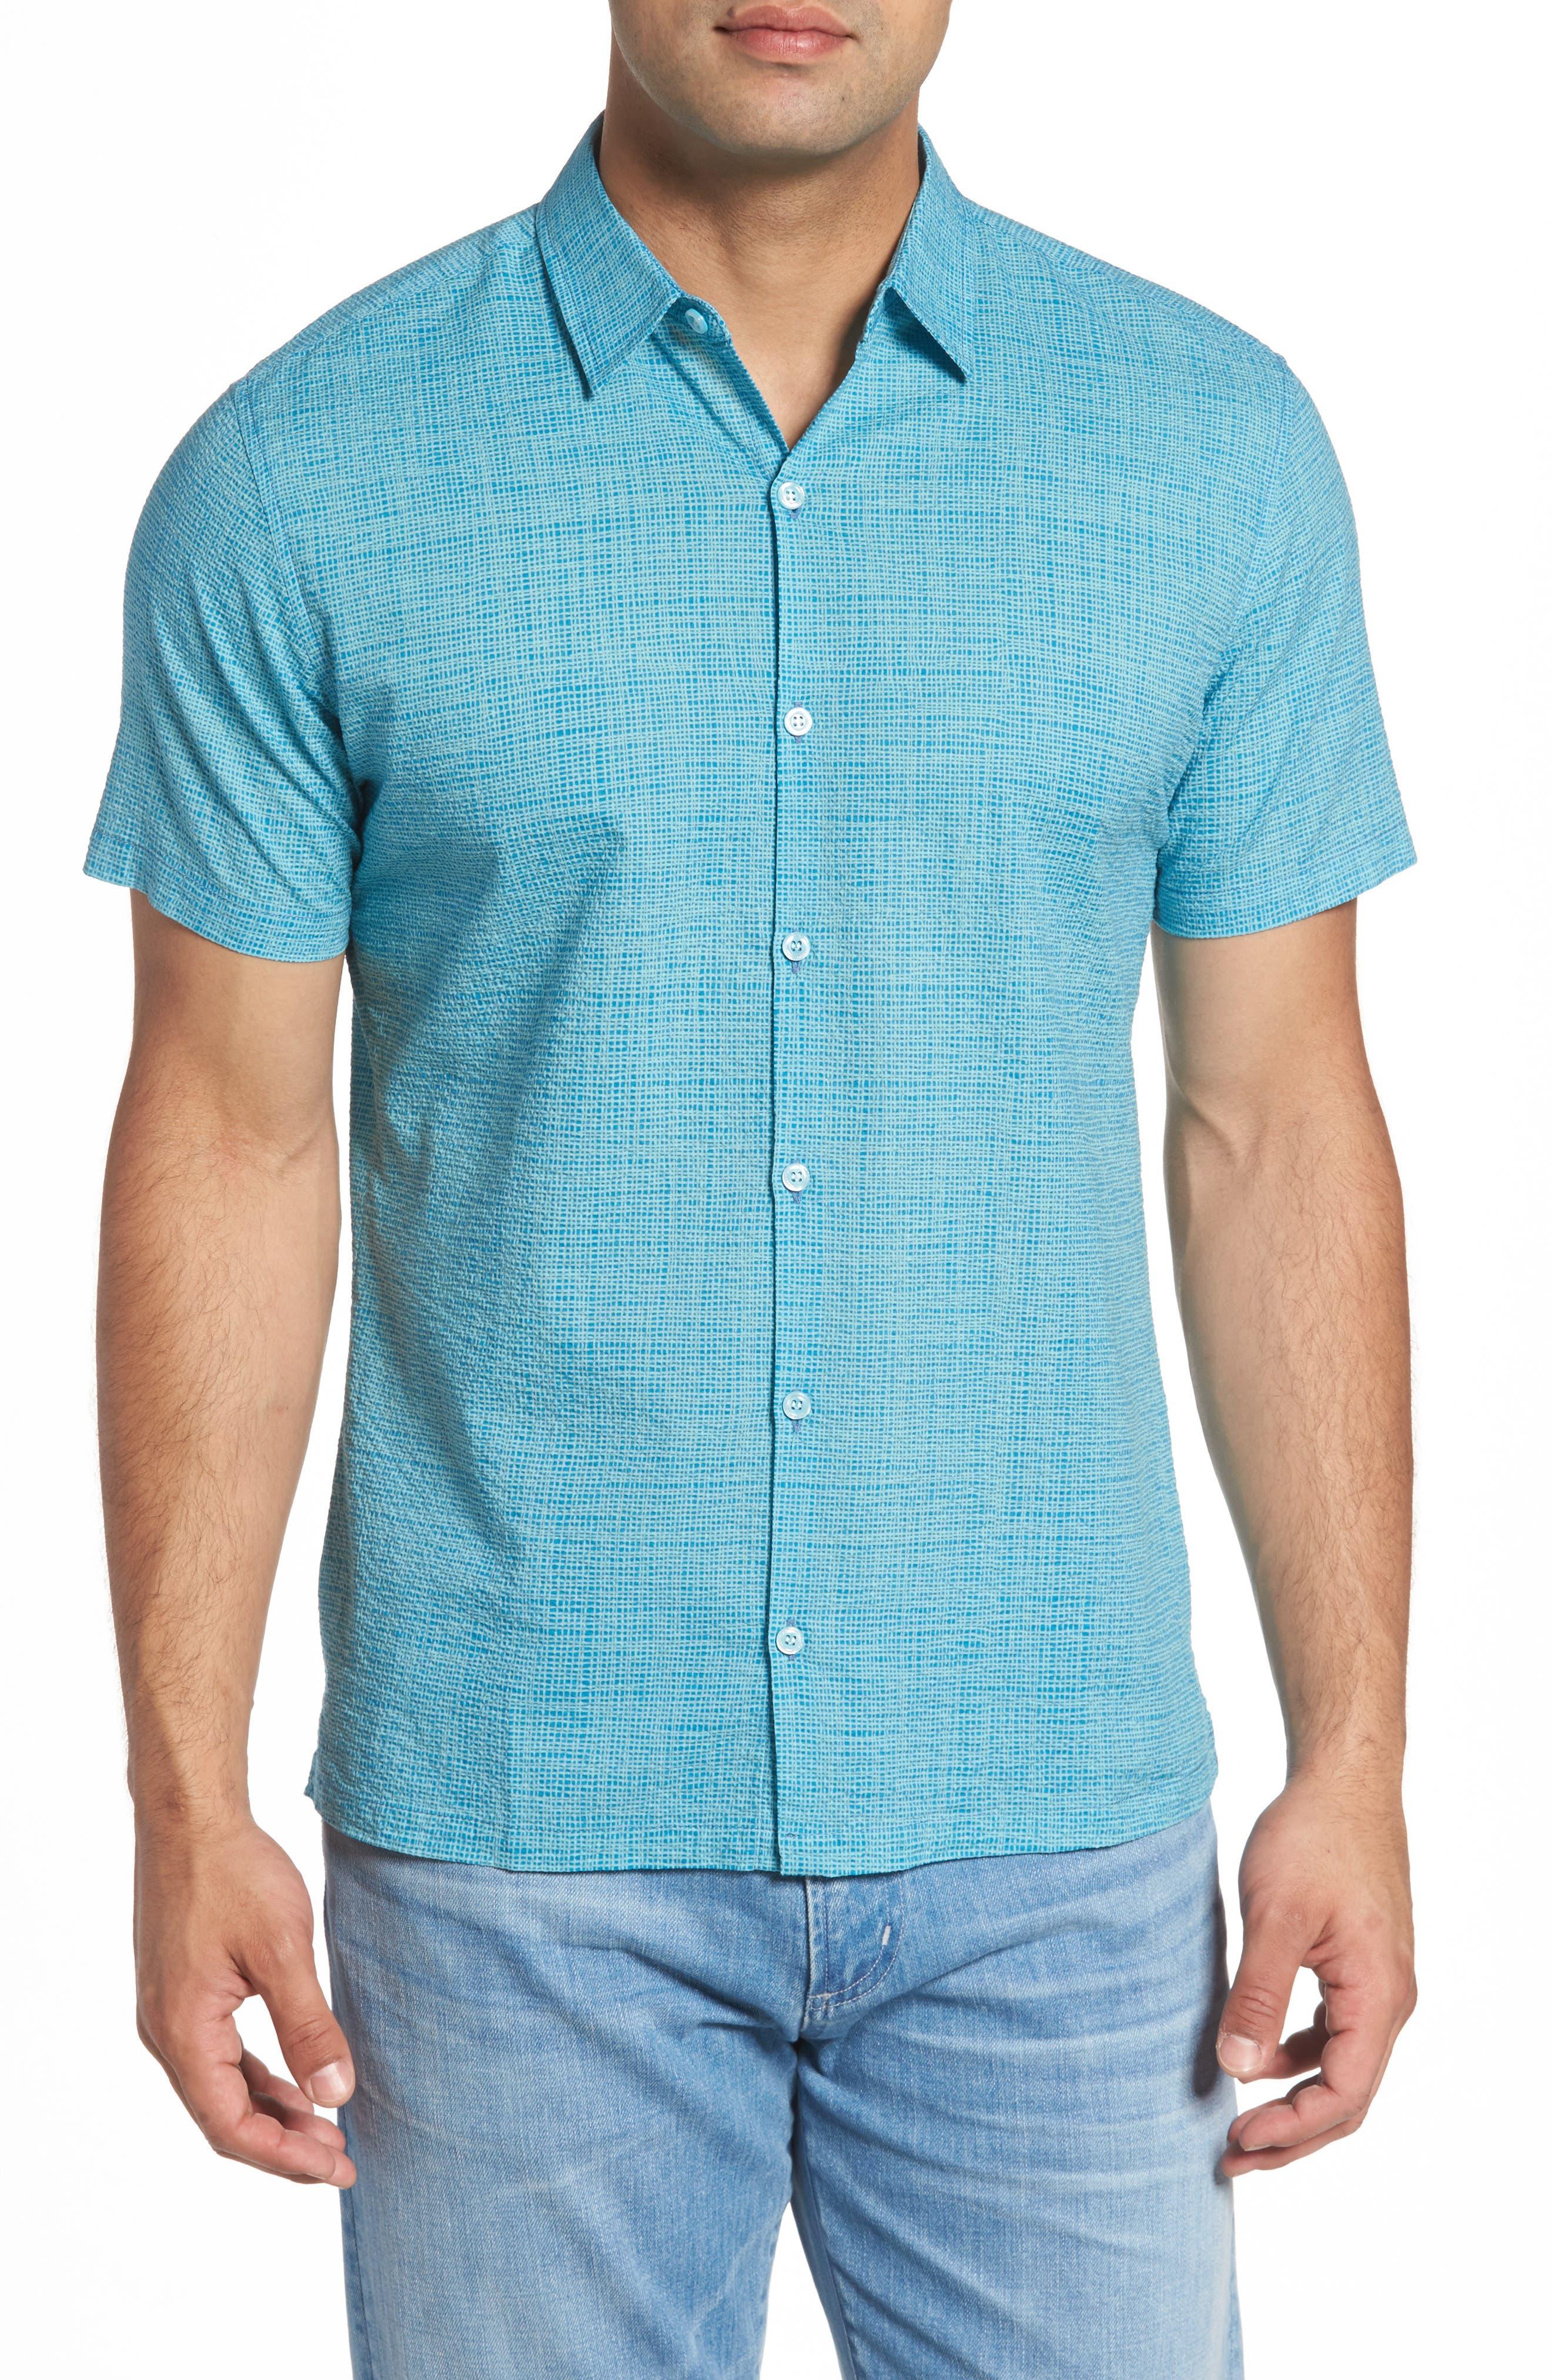 Net Worth Slim Fit Camp Shirt,                         Main,                         color, 400